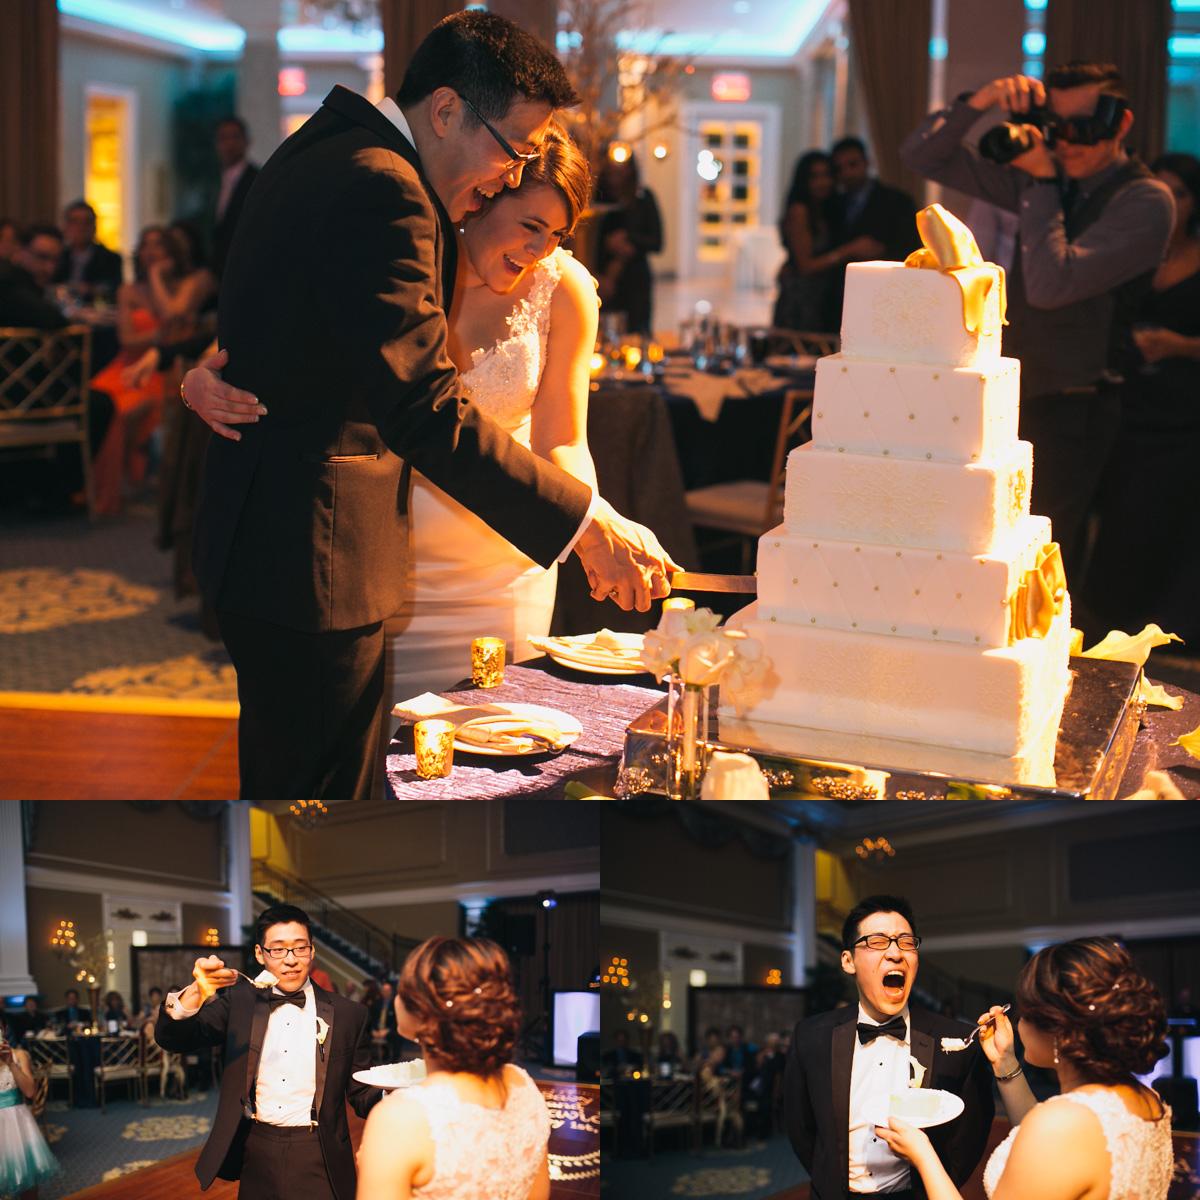 rob august photography nj wedding savy dave 062